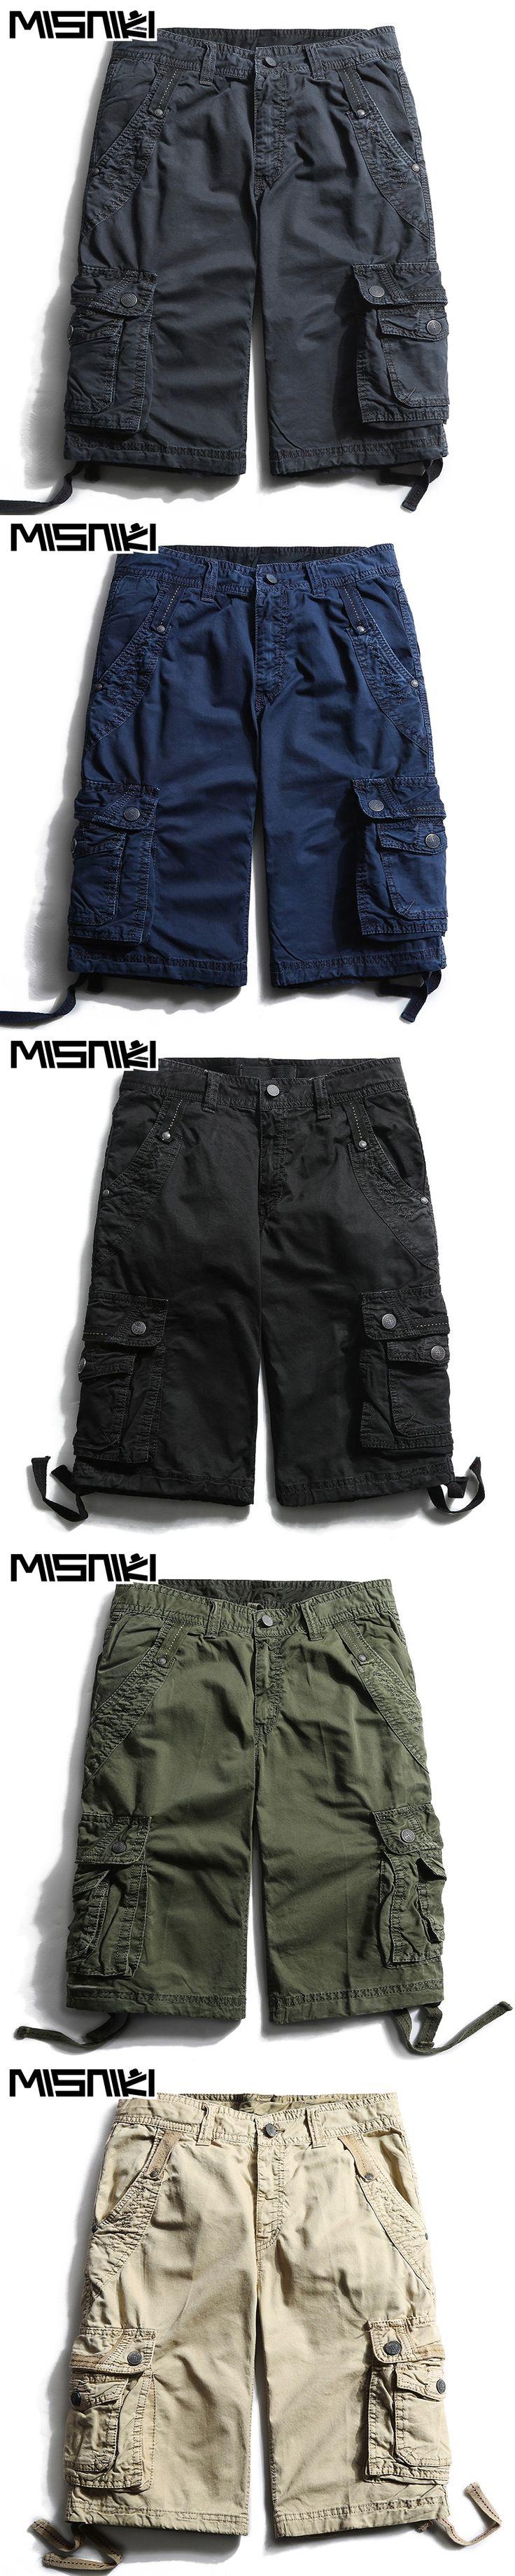 MISNIKI High Quality Cotton Cargo Shorts Men Casual Slim Multi-pocket Military Shorts Mens